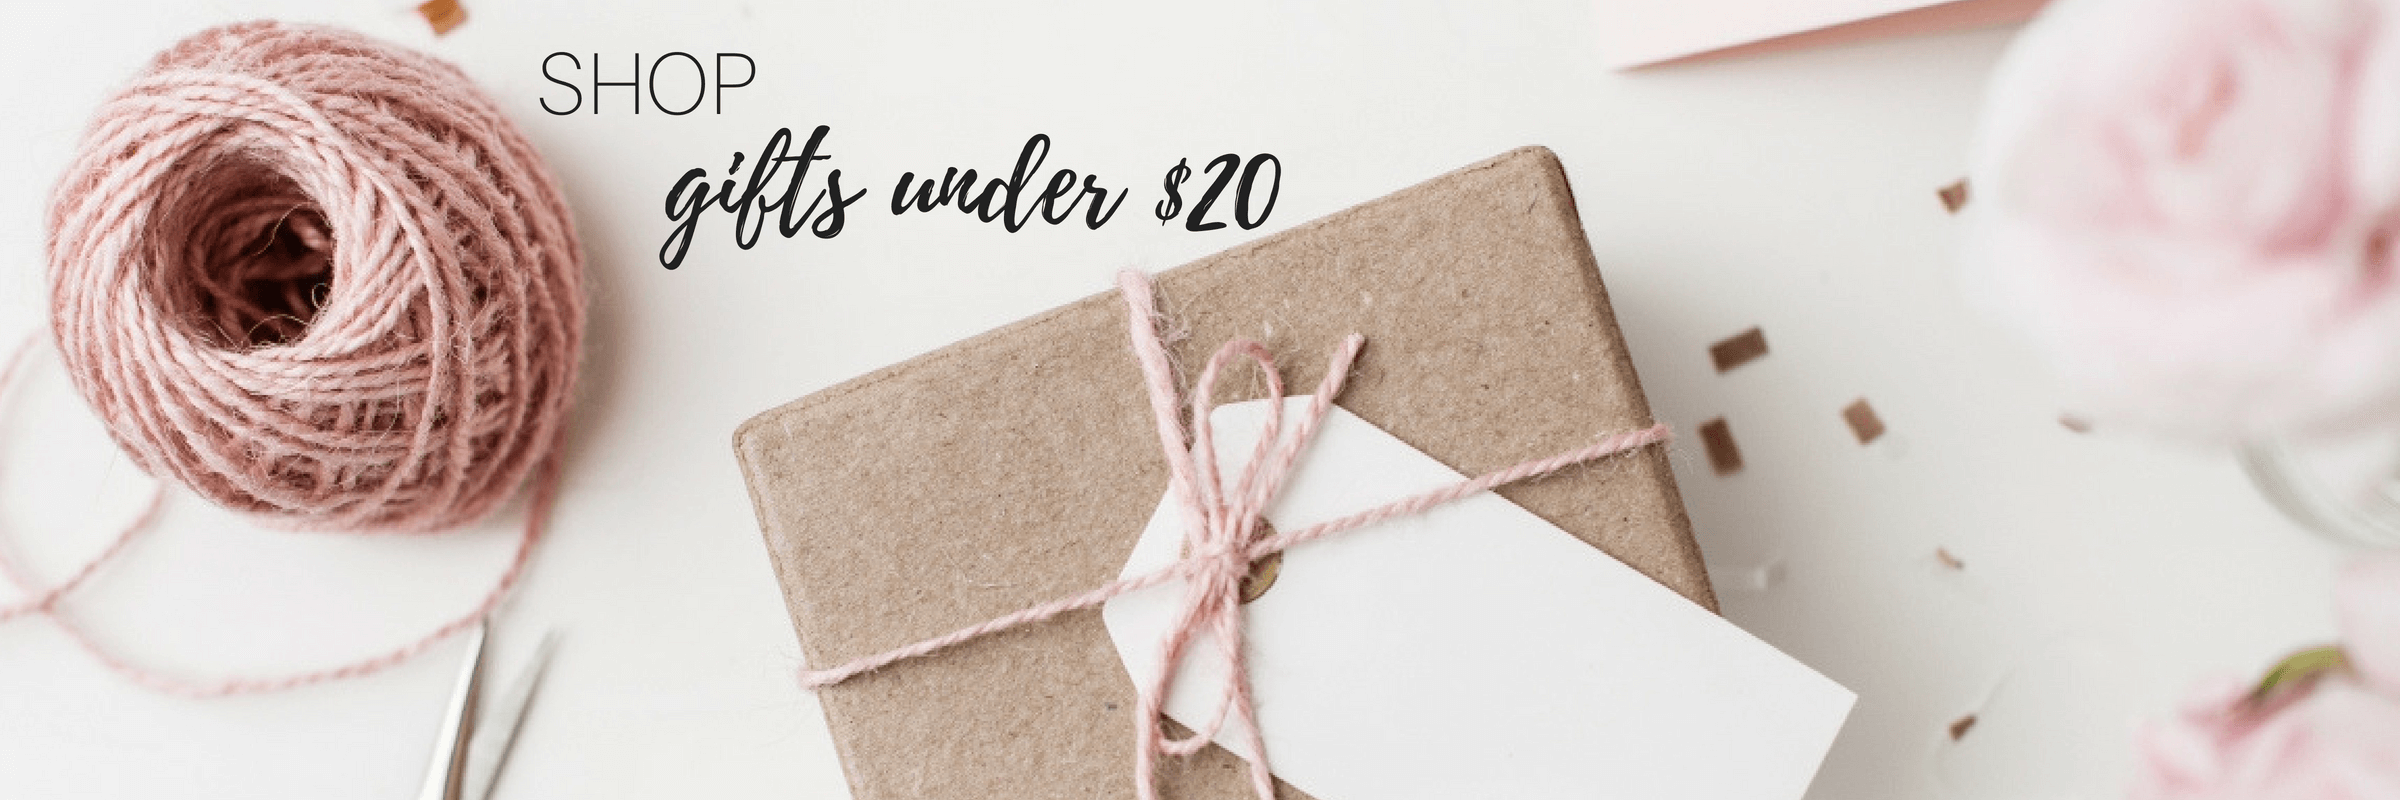 Baking Gifts under $20